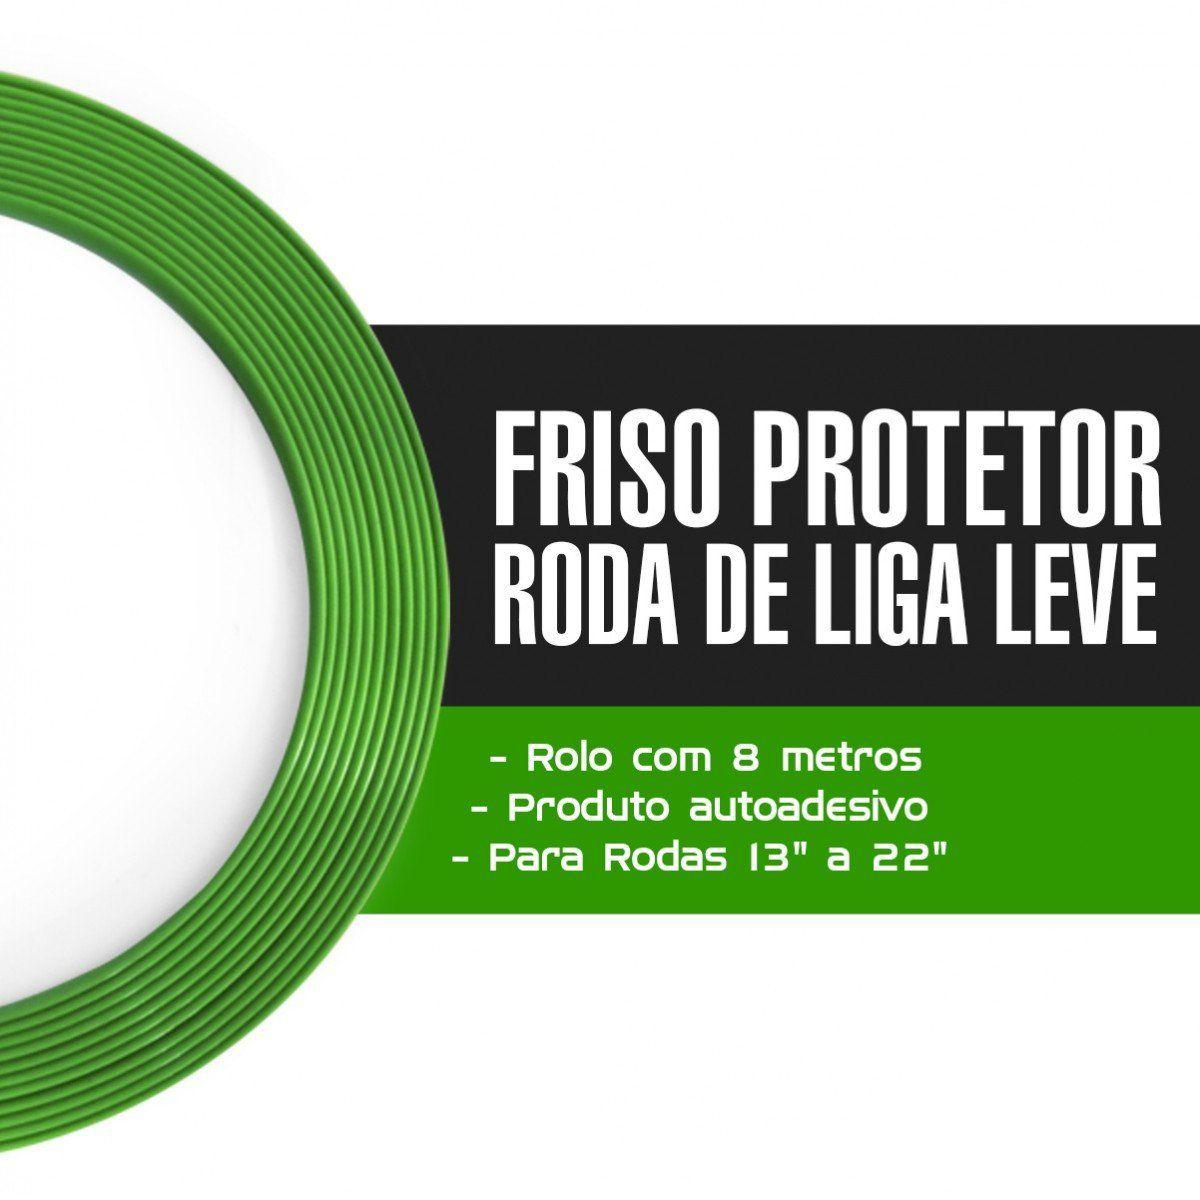 Friso Protetor Roda Liga Leve Esportiva Tuning 8m - Verde